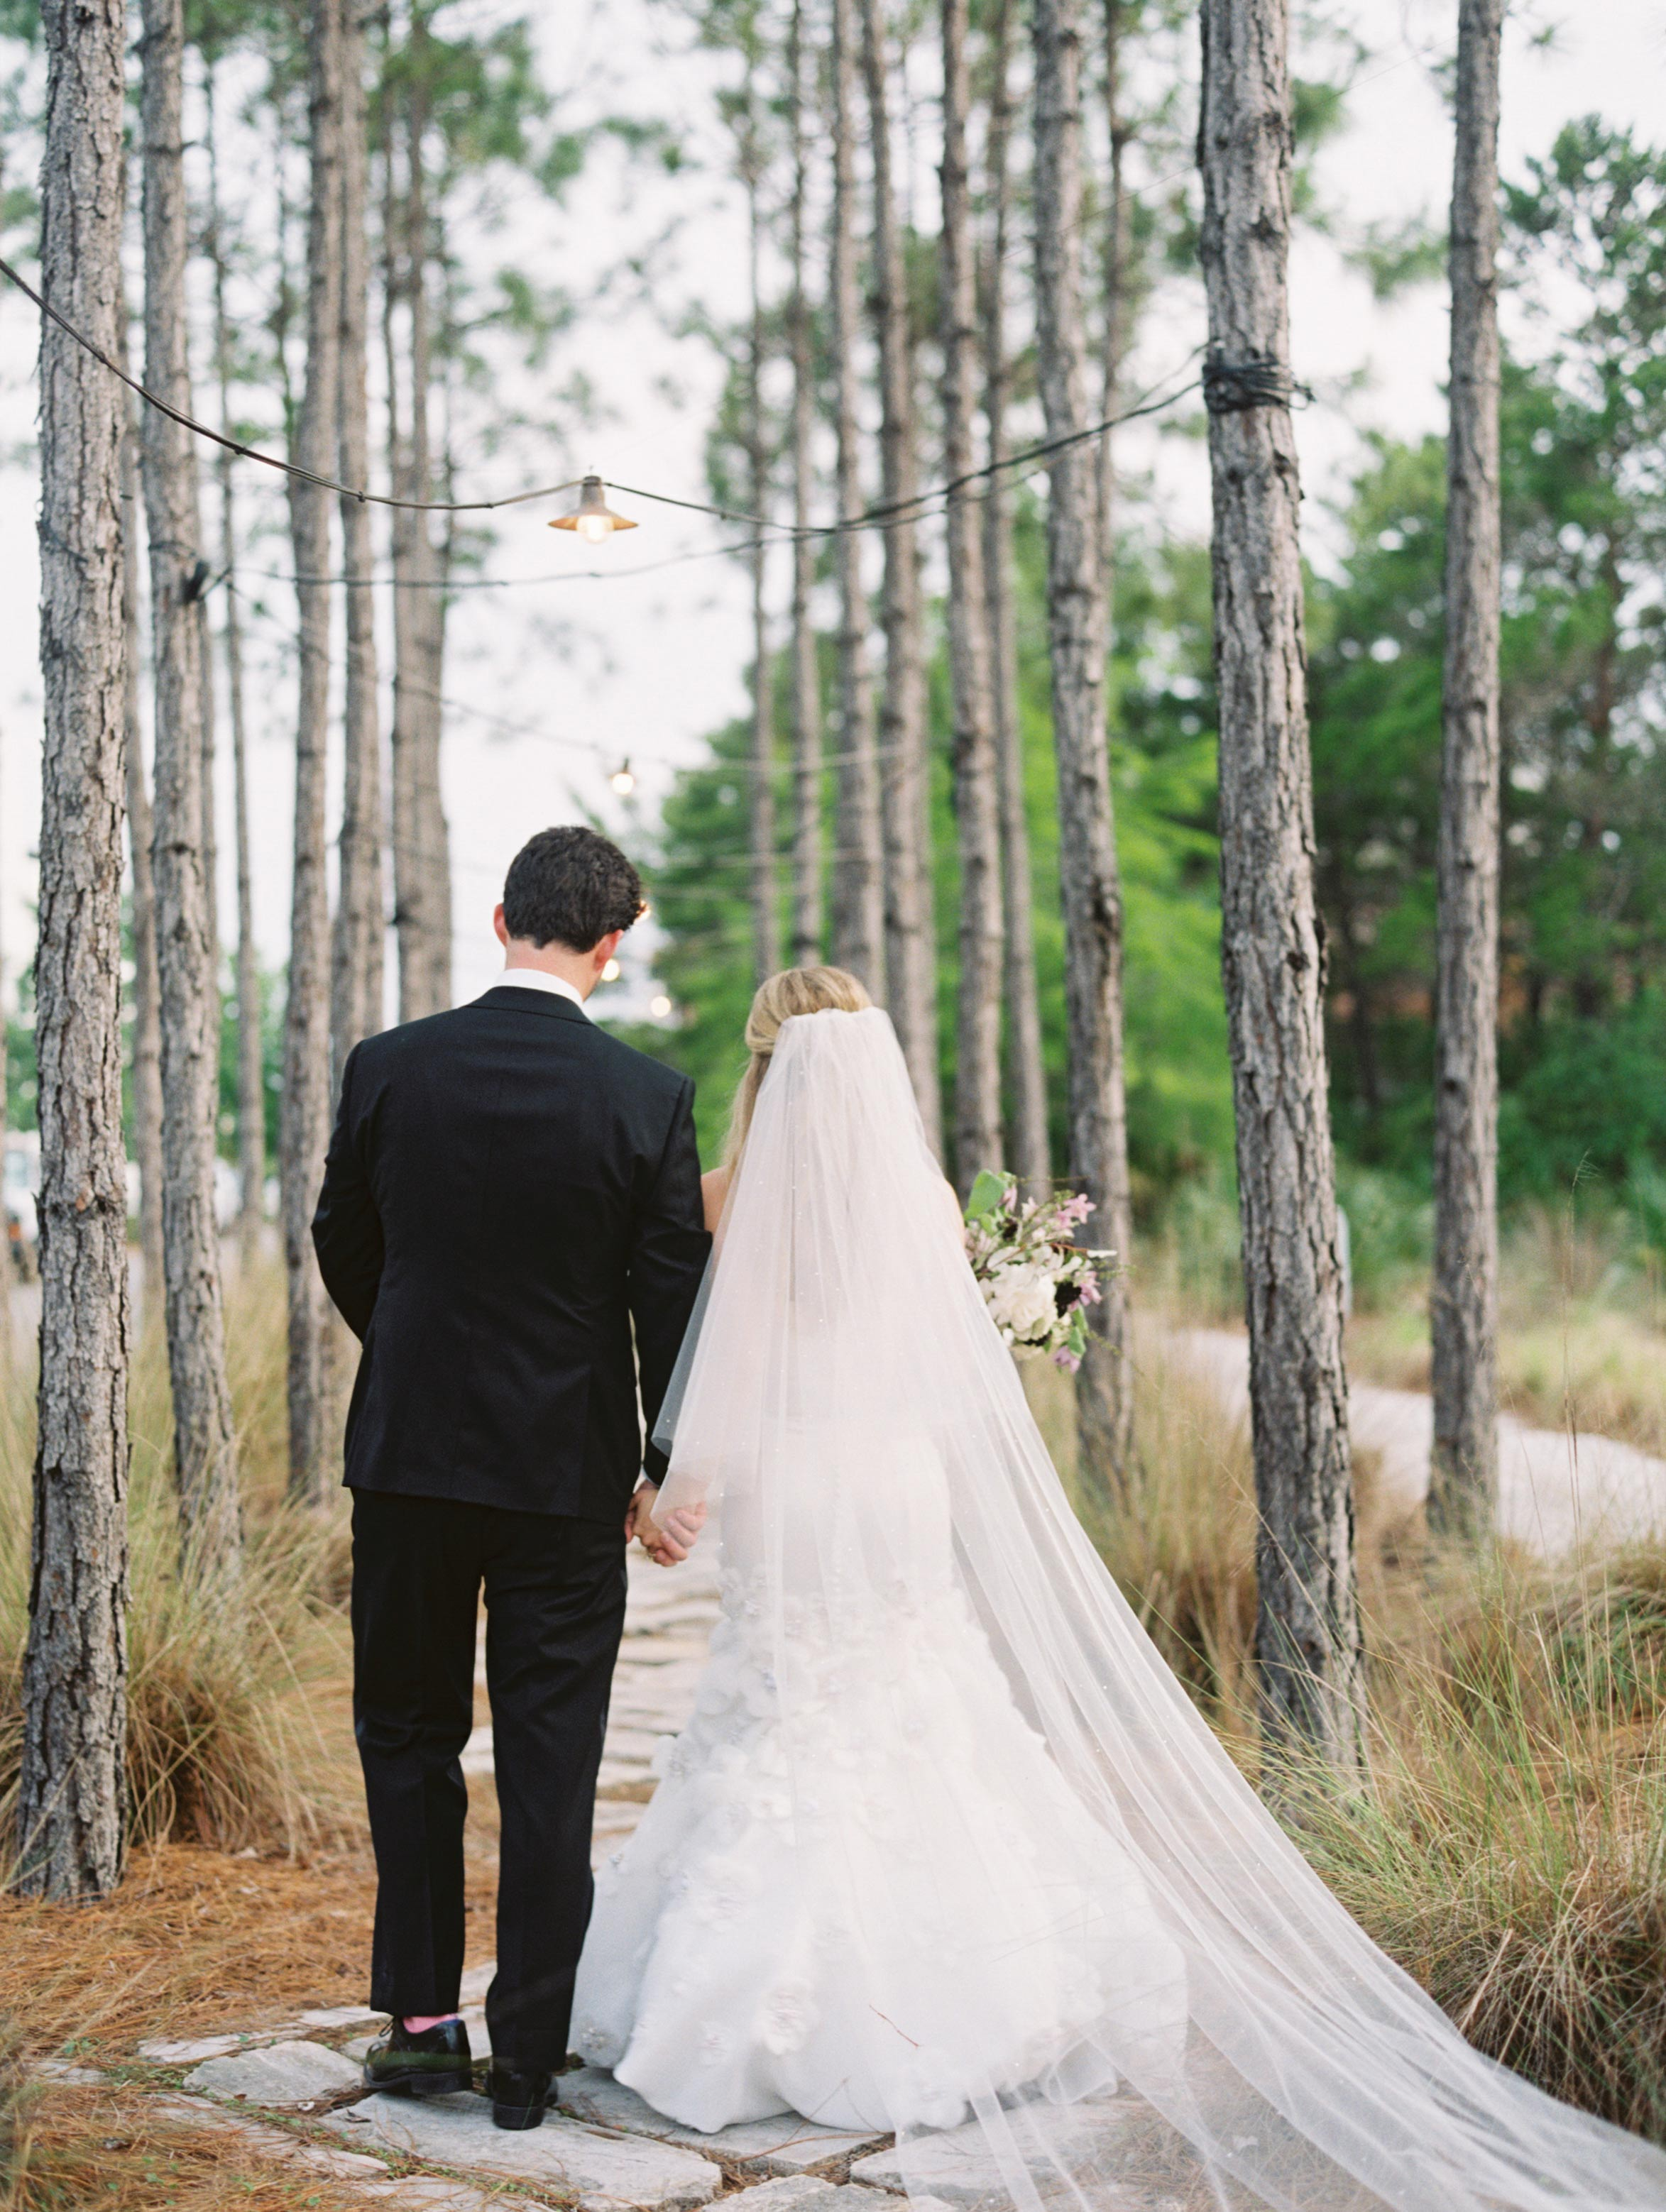 leighton craig wedding couple walking down path